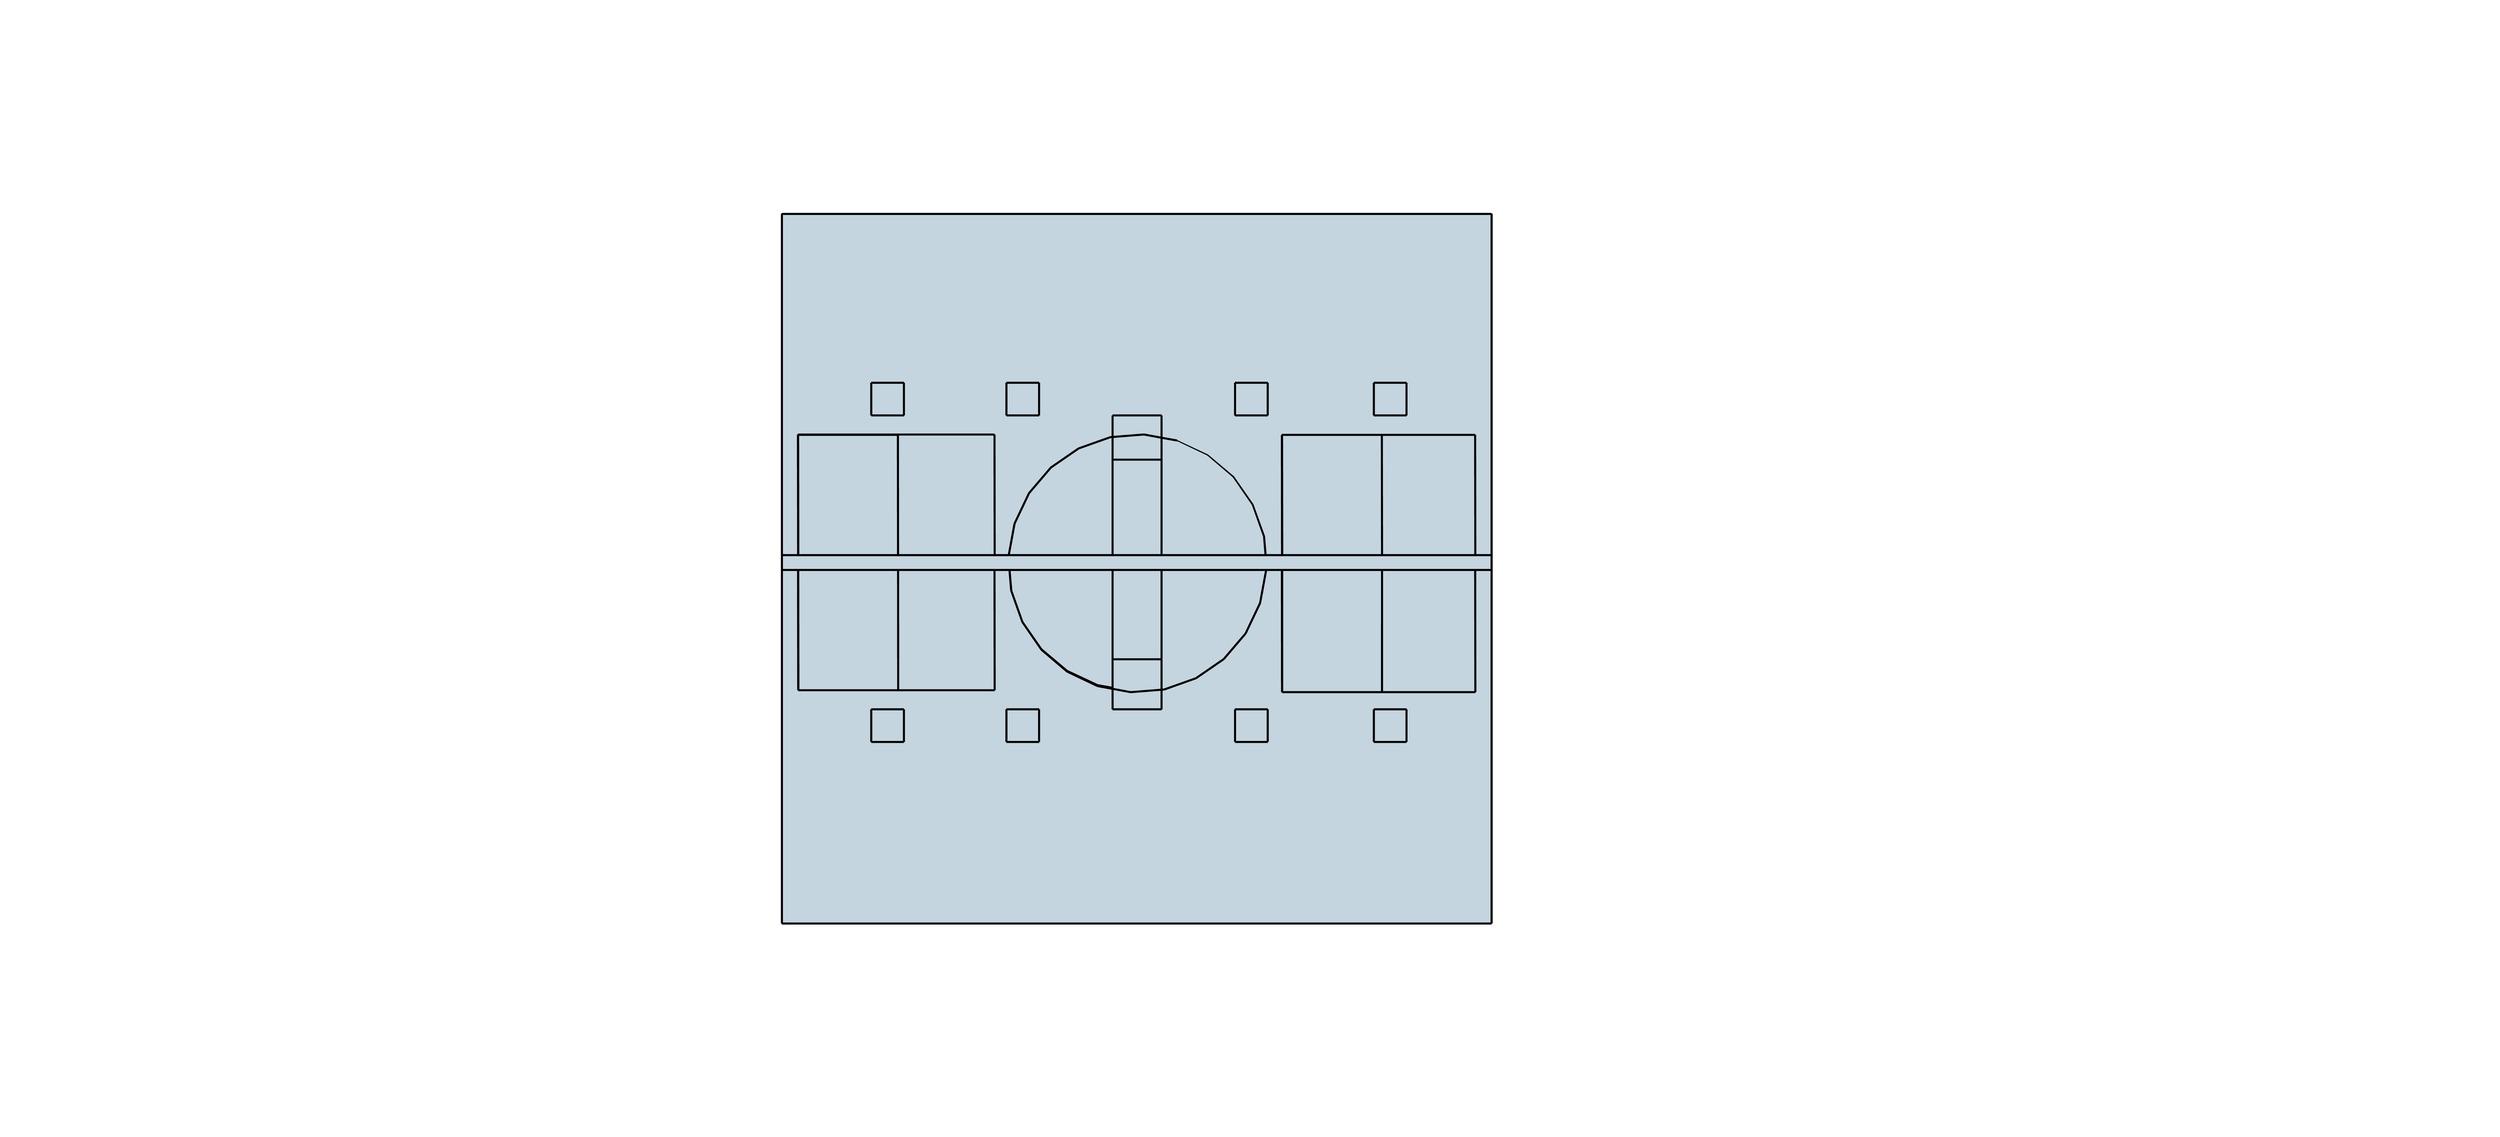 sketchupmodel_Assignment5-page-0.jpg